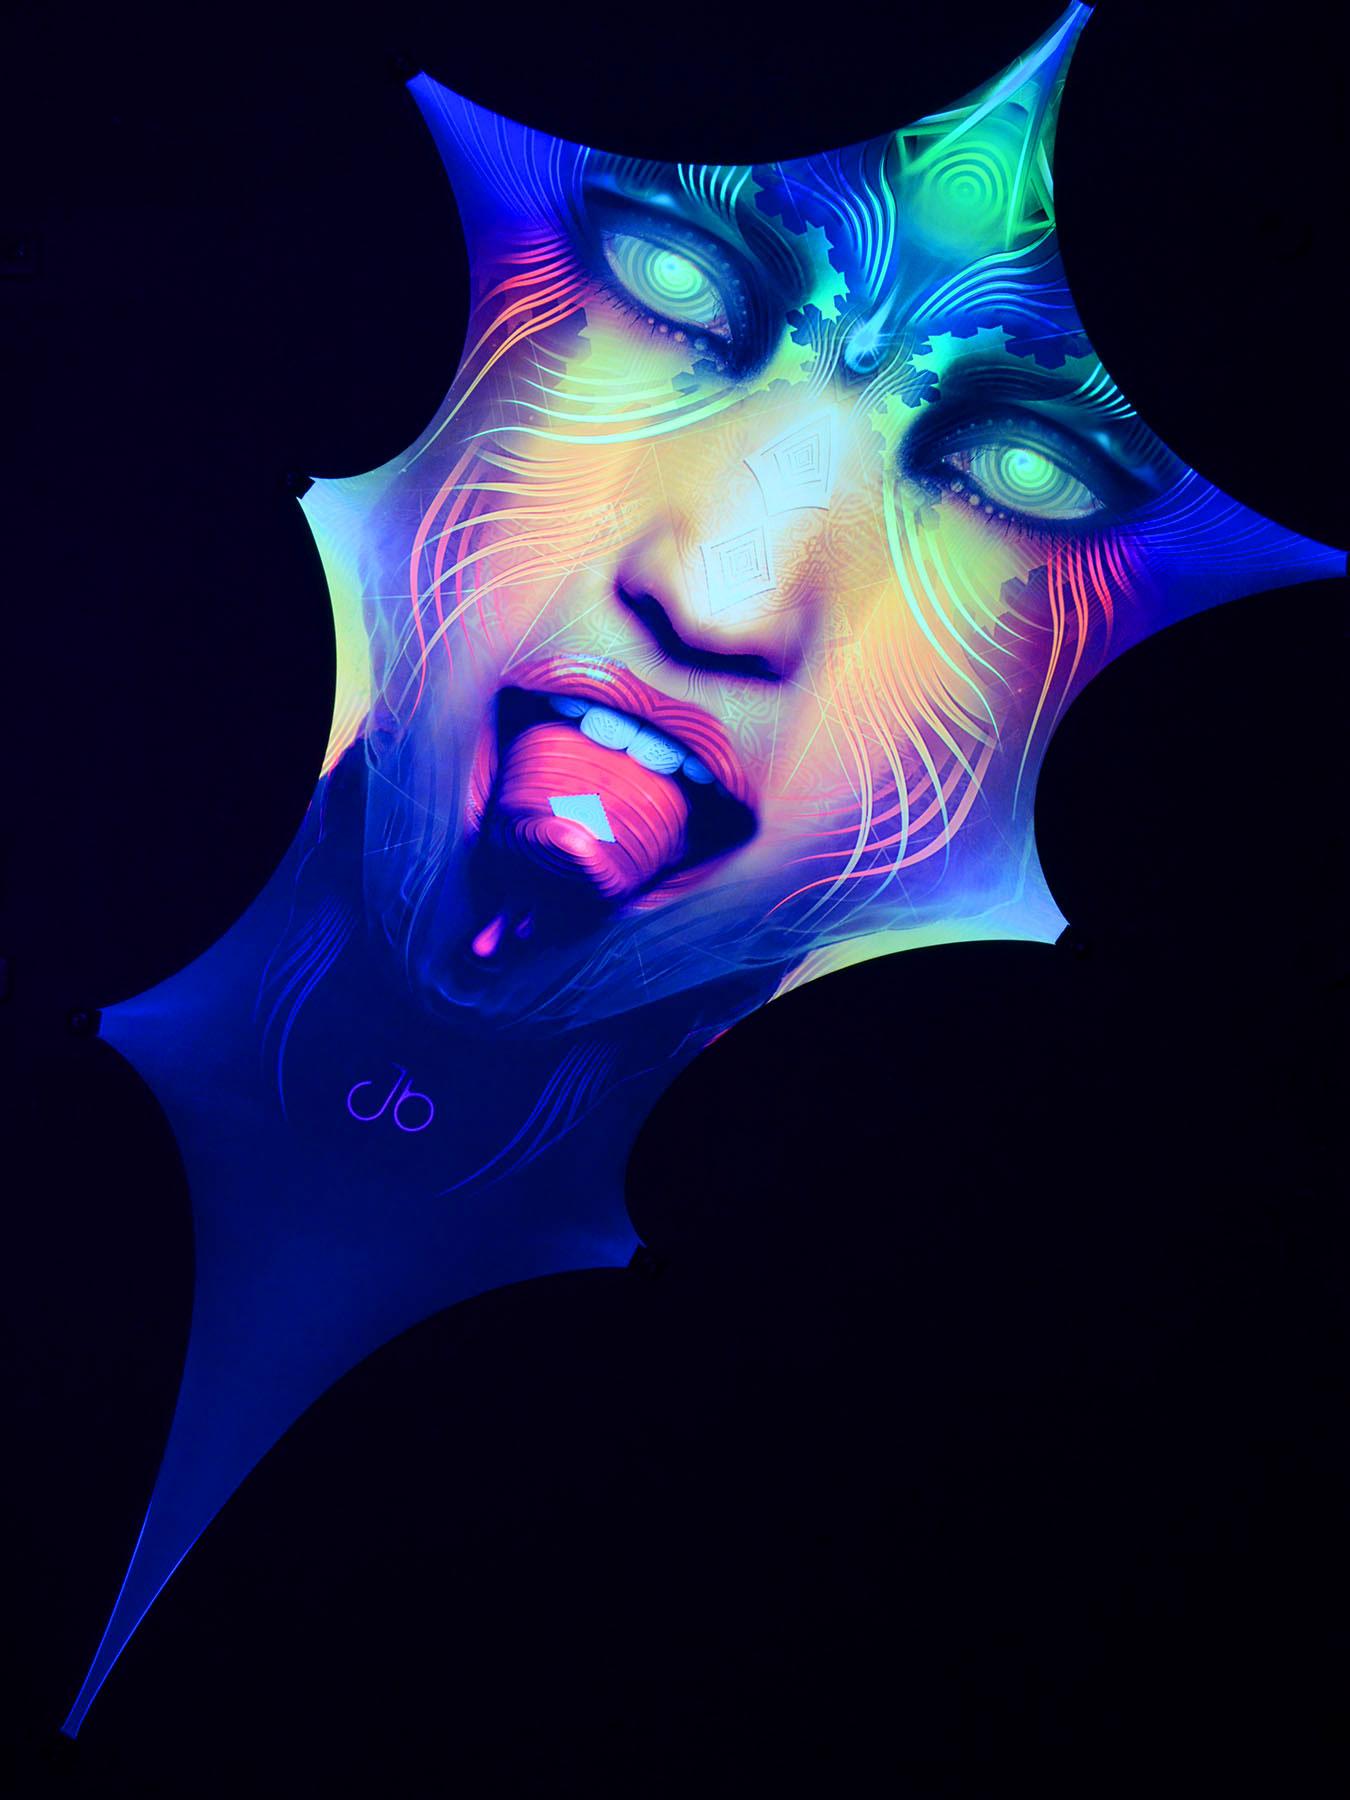 Digital Art by Justin Bonnet